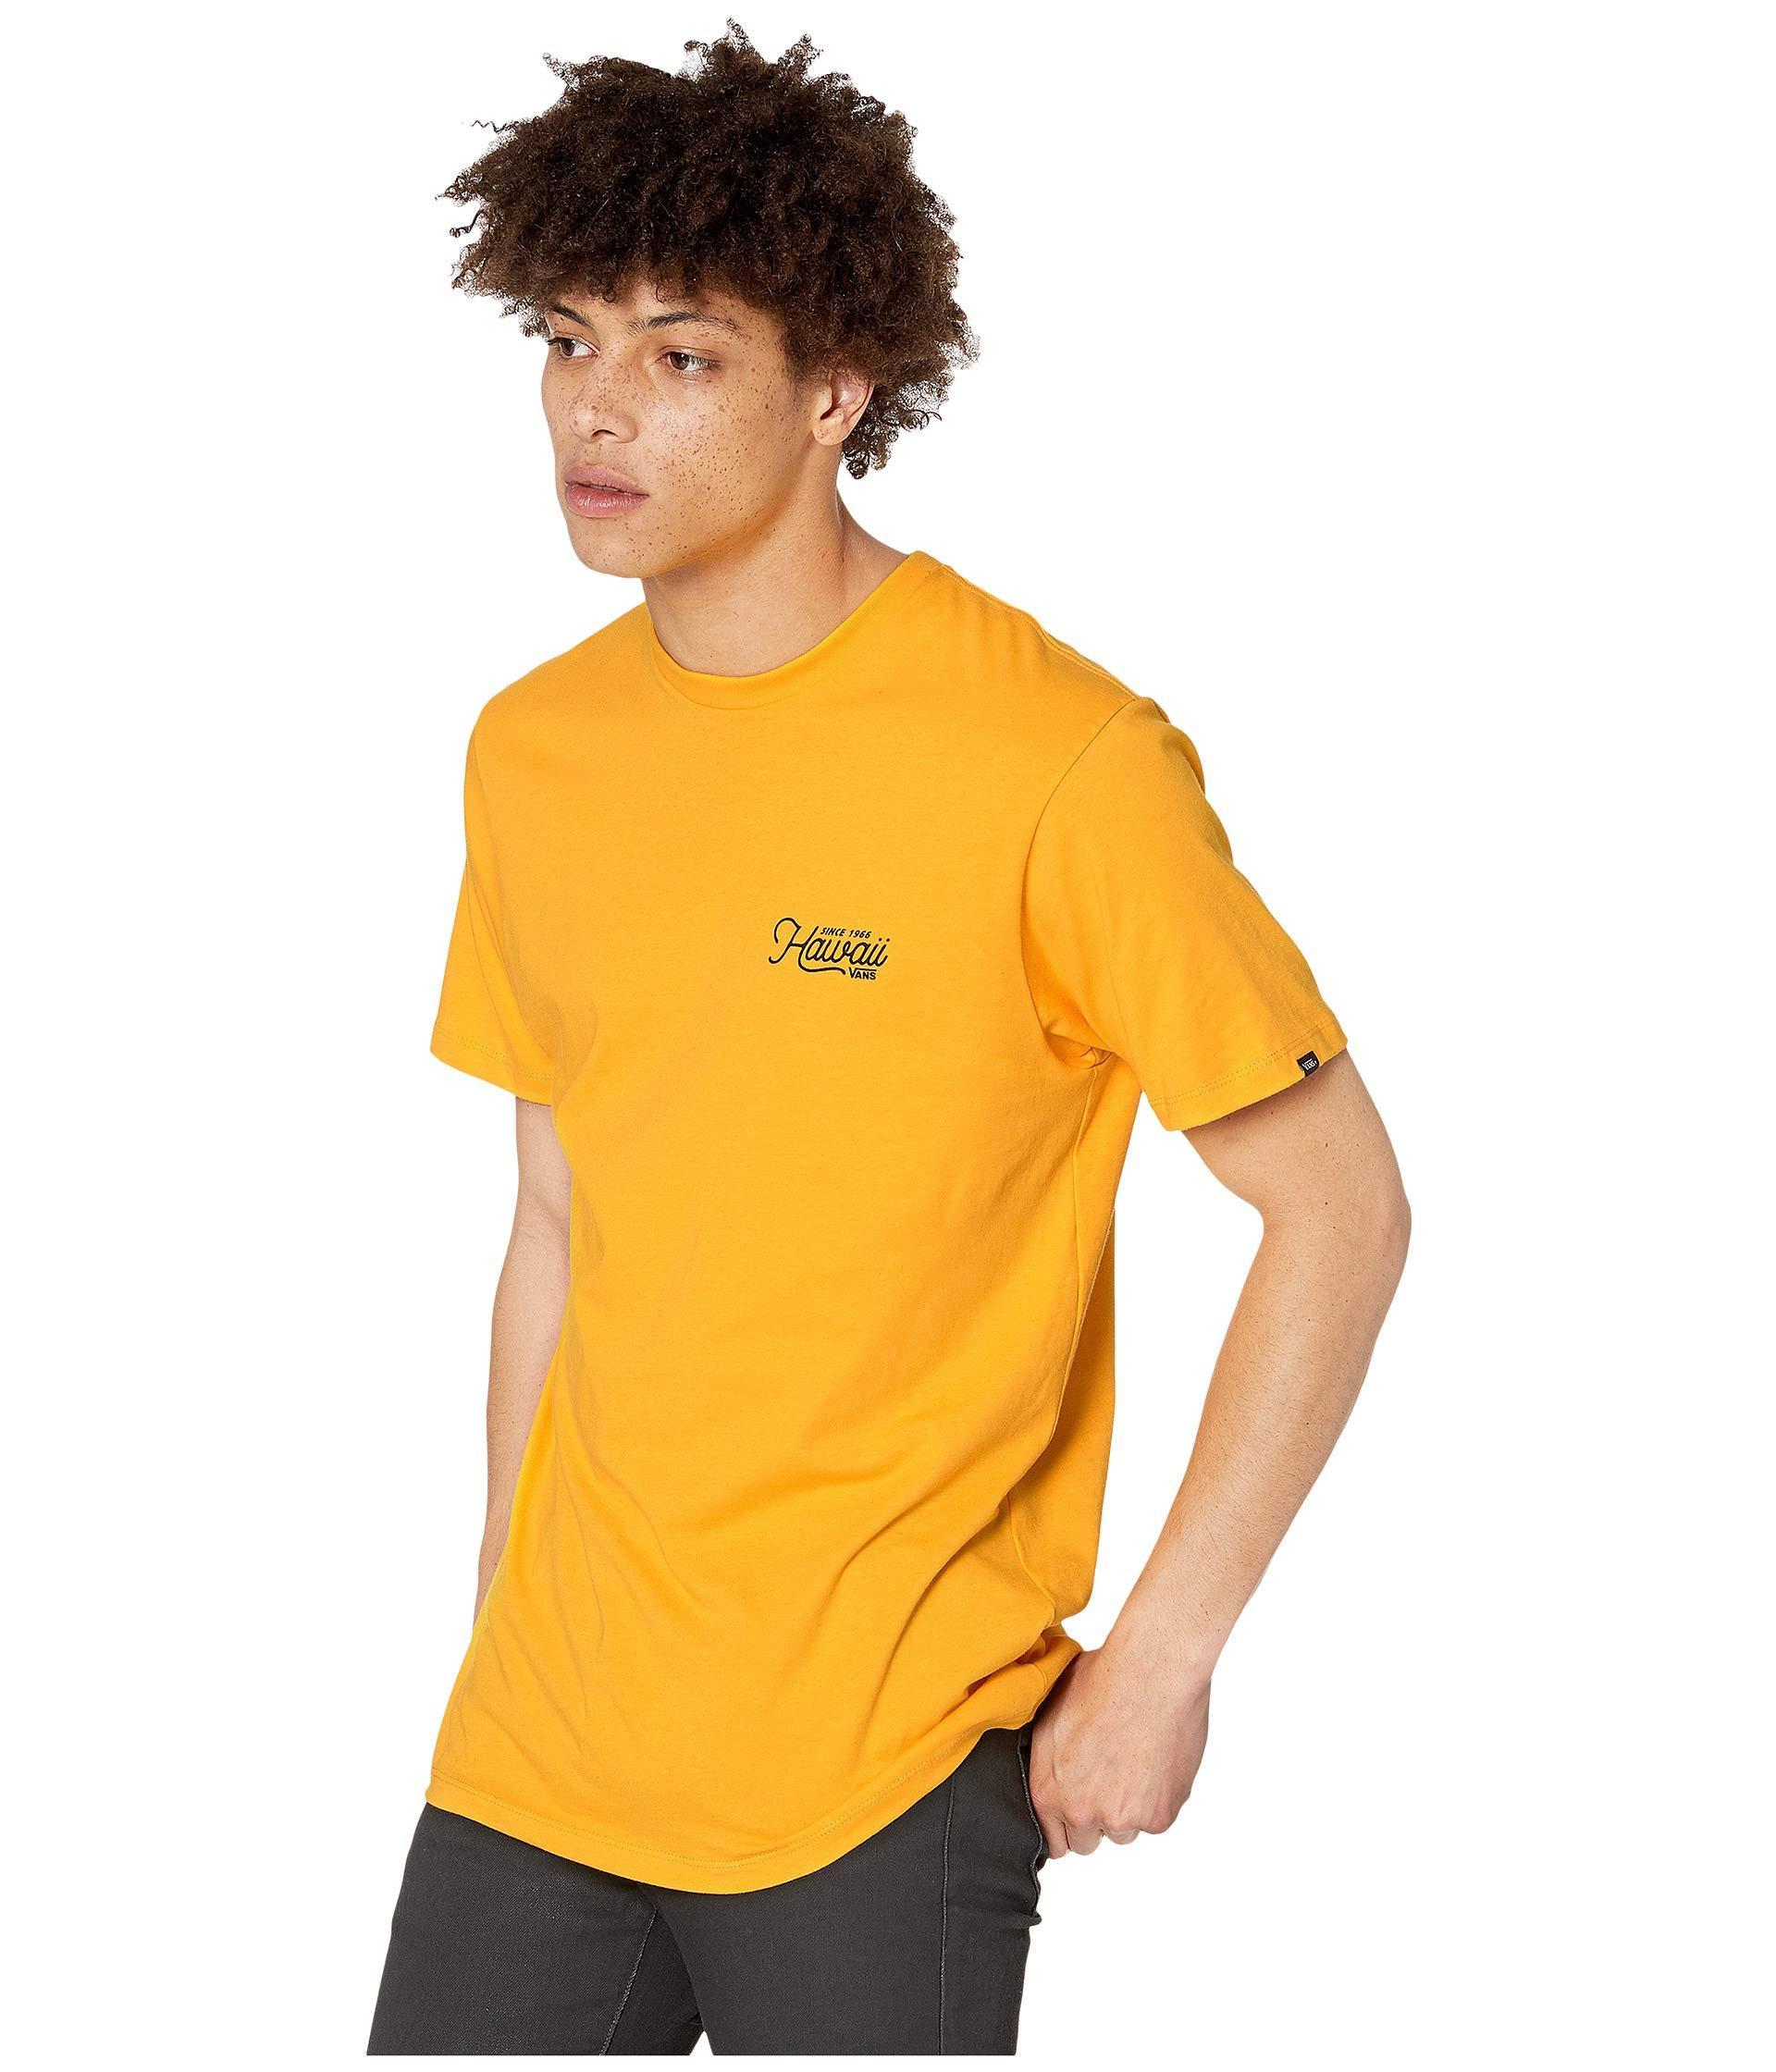 5cdd37291e10 Vans Original Hi T-shirt (gold Fusion) Men's T Shirt in Yellow for Men -  Lyst